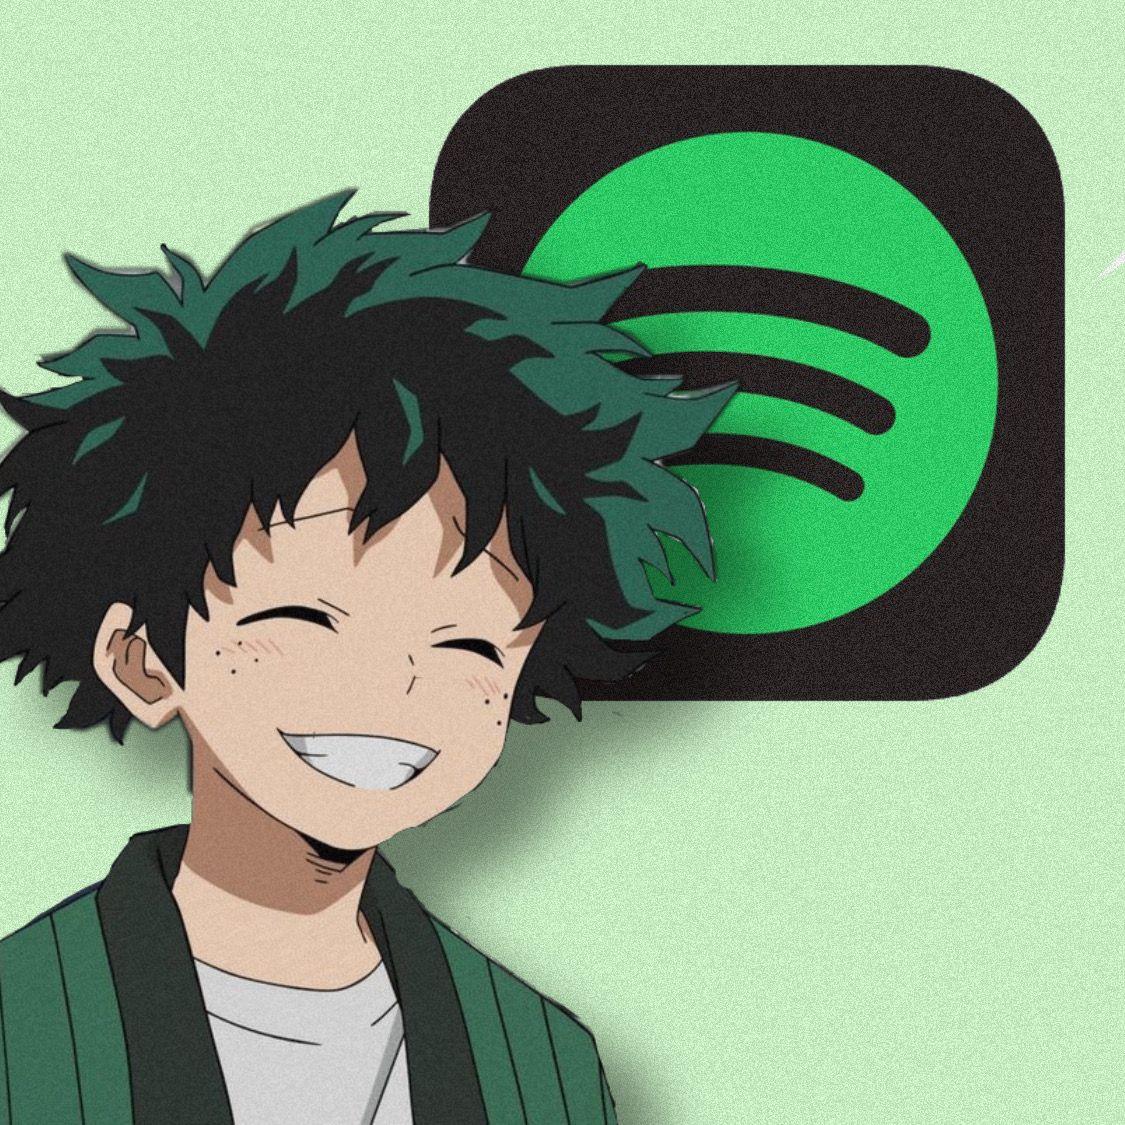 freetoedit anime app icon deku spotify anime app